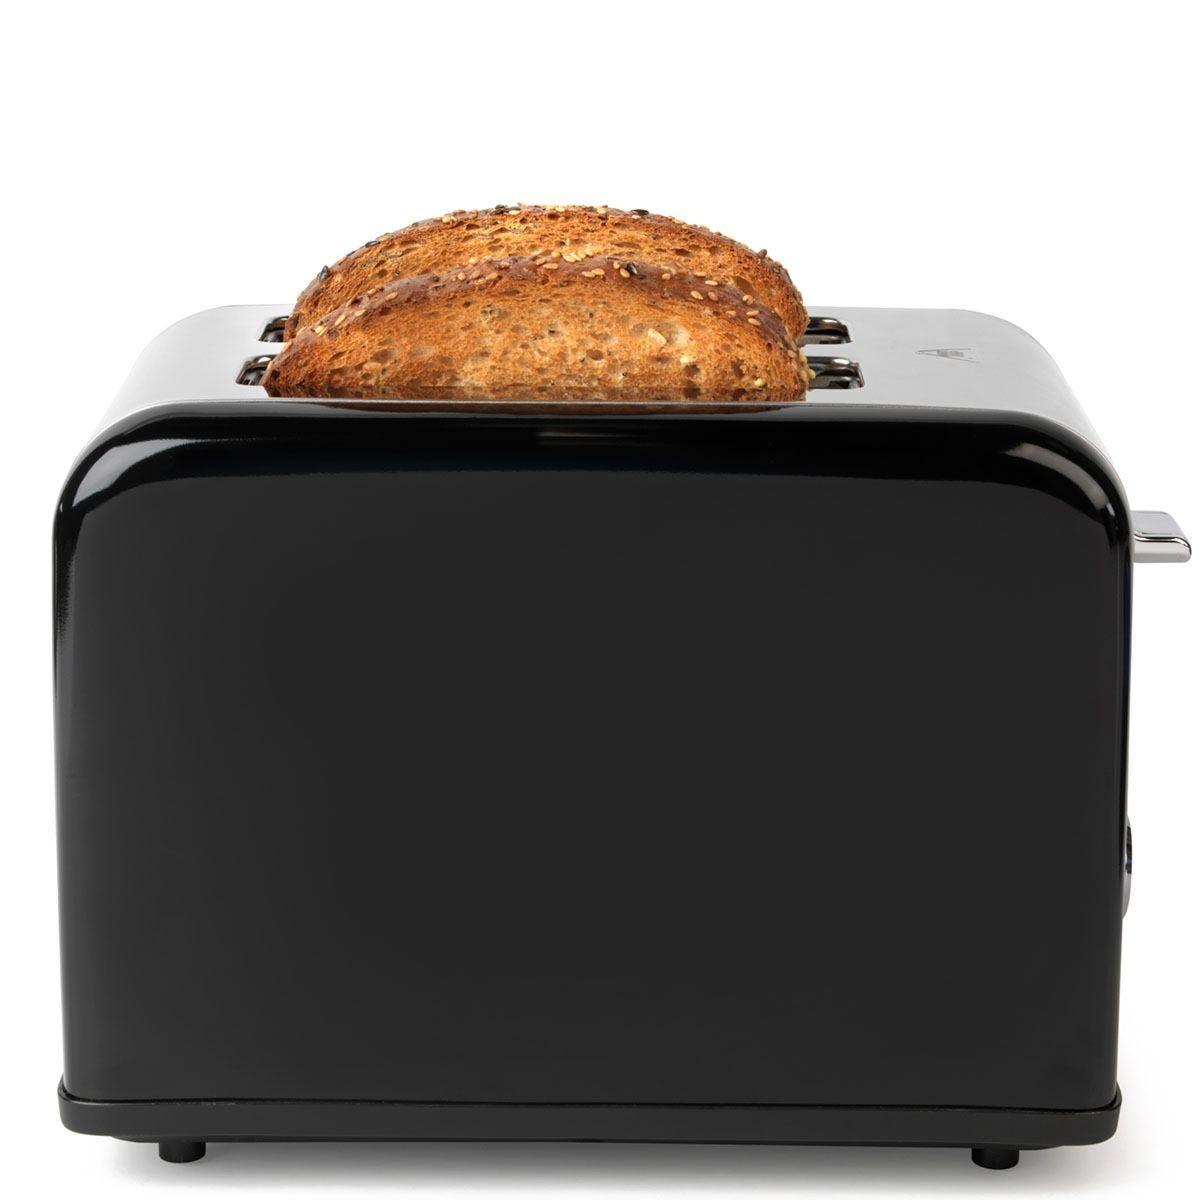 Salter EK3399BLACK Riga 815W 2-Slice Toaster - Black and Stainless Steel